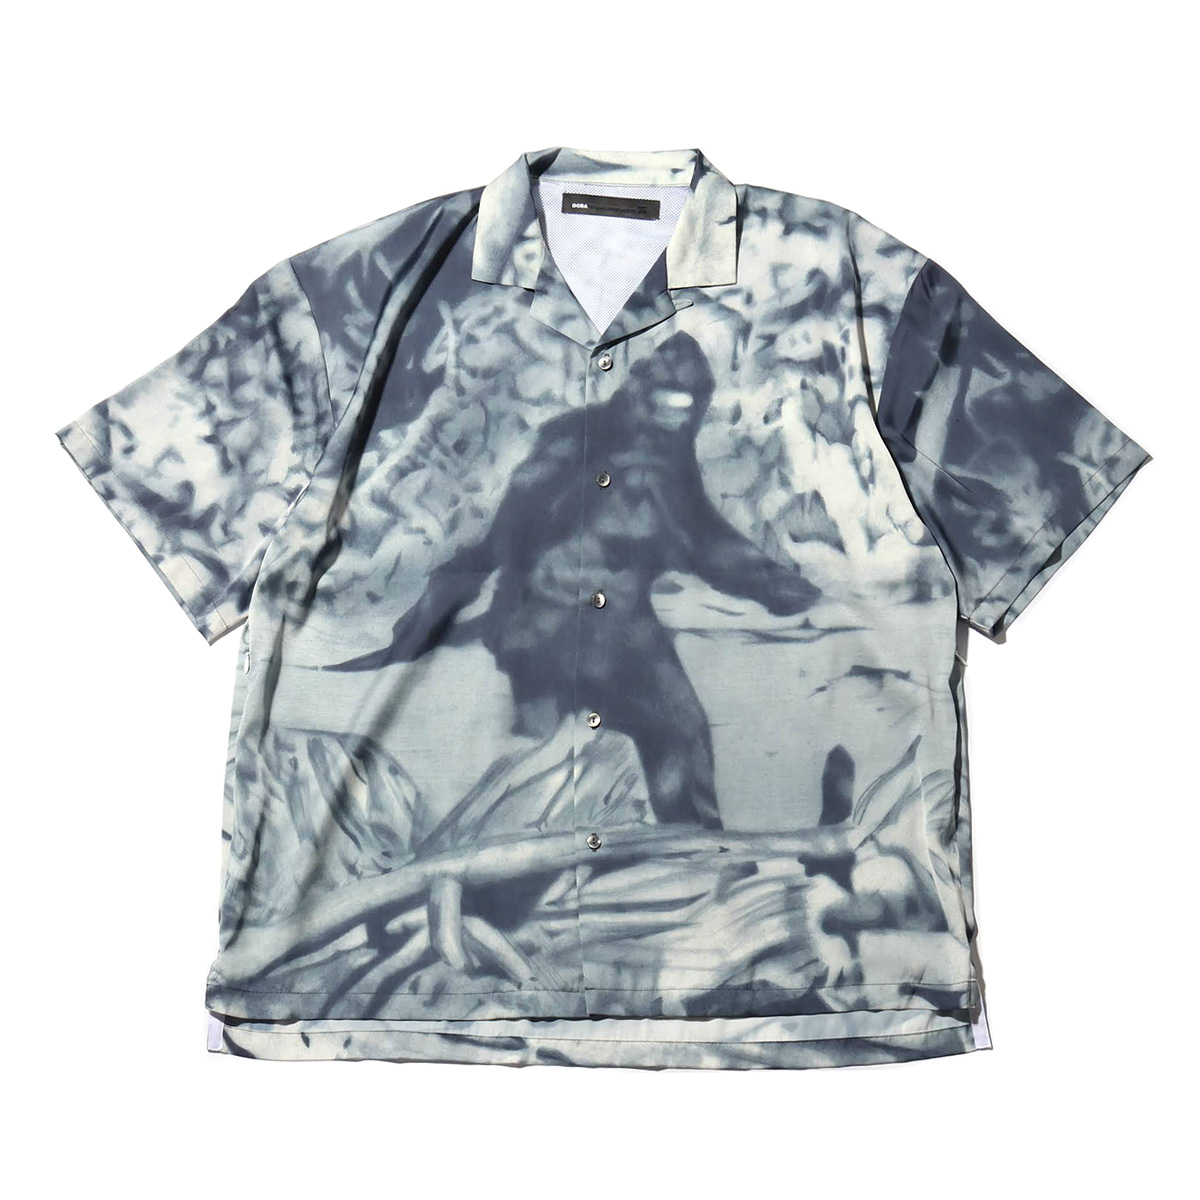 DC SHOES DCBA 19 OPEN-COLLARED SHIRT SS (ディーシーシューズ DCBA 19 オープンカラー シャツ SS)PRINT【メンズ Tシャツ】19SS-I